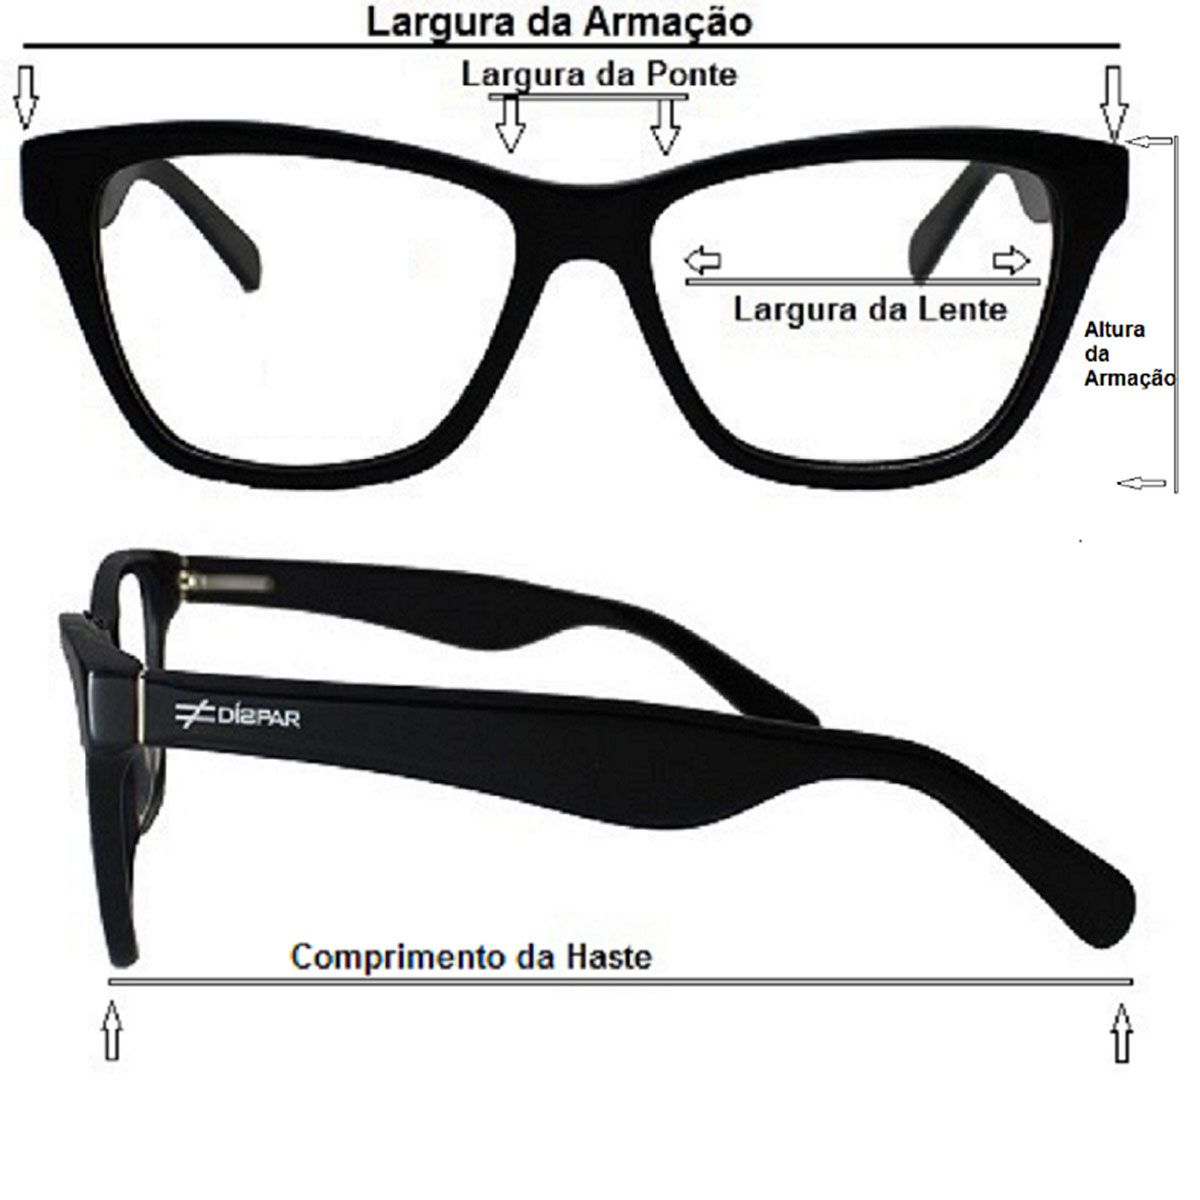 Armação para Óculos Díspar D2226 - Demi